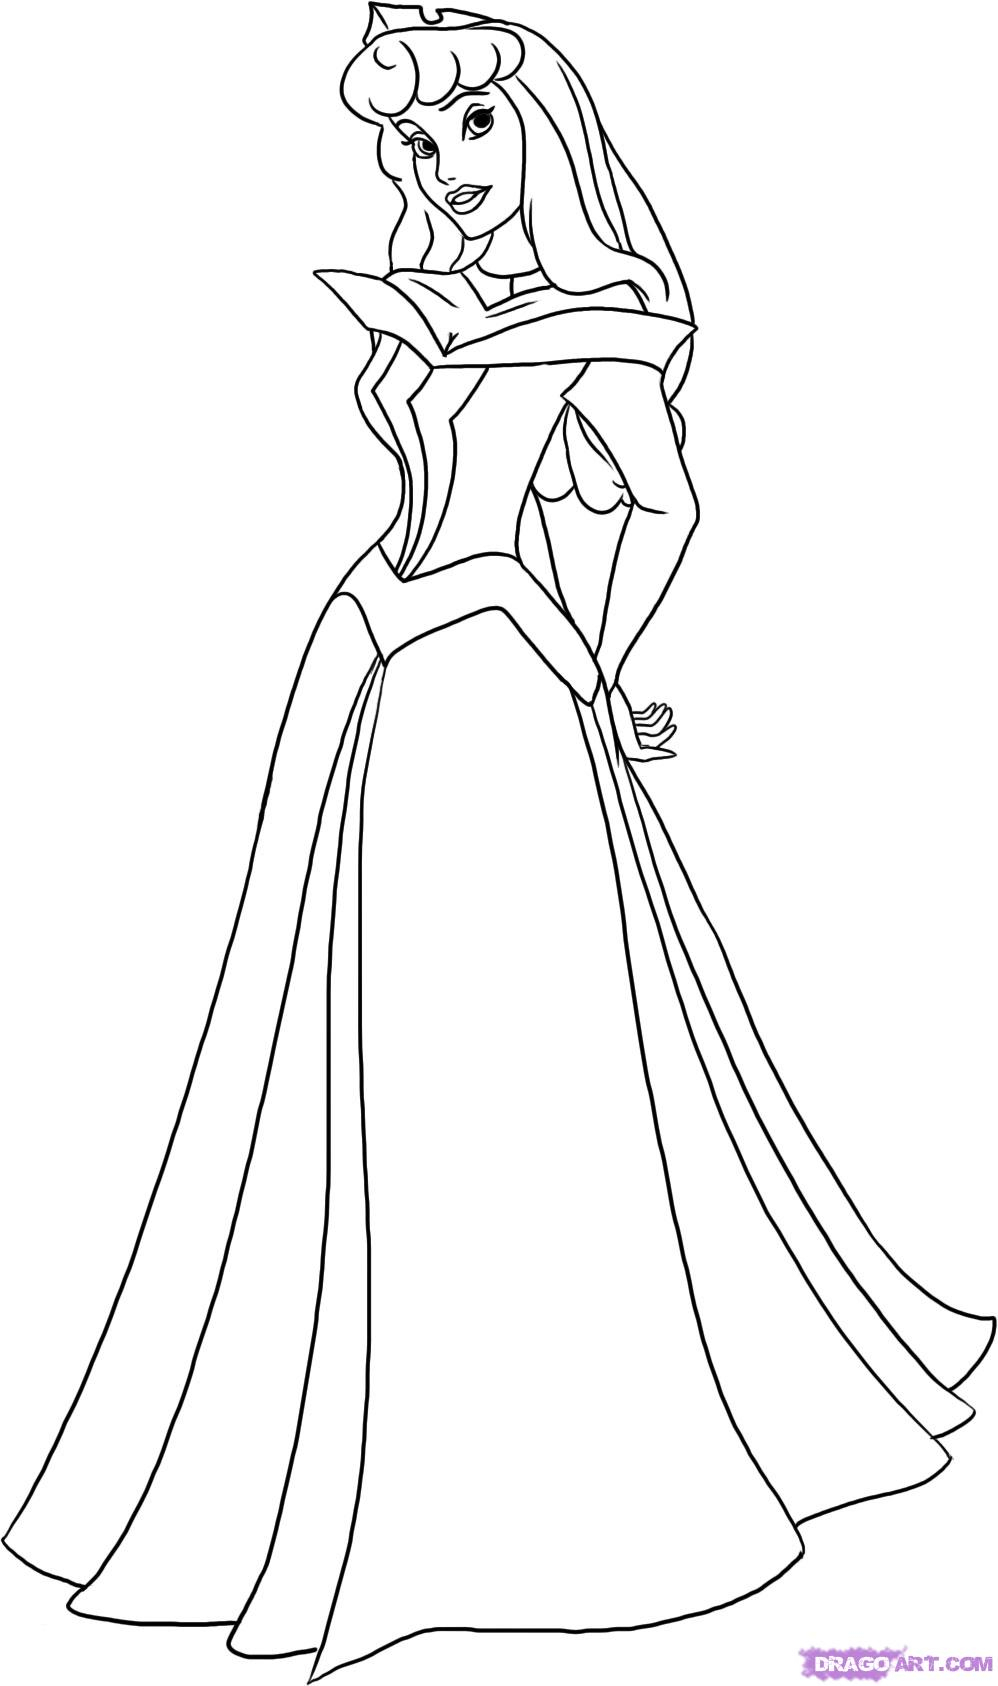 998x1686 Disney Princess Characters To Draw Robocast